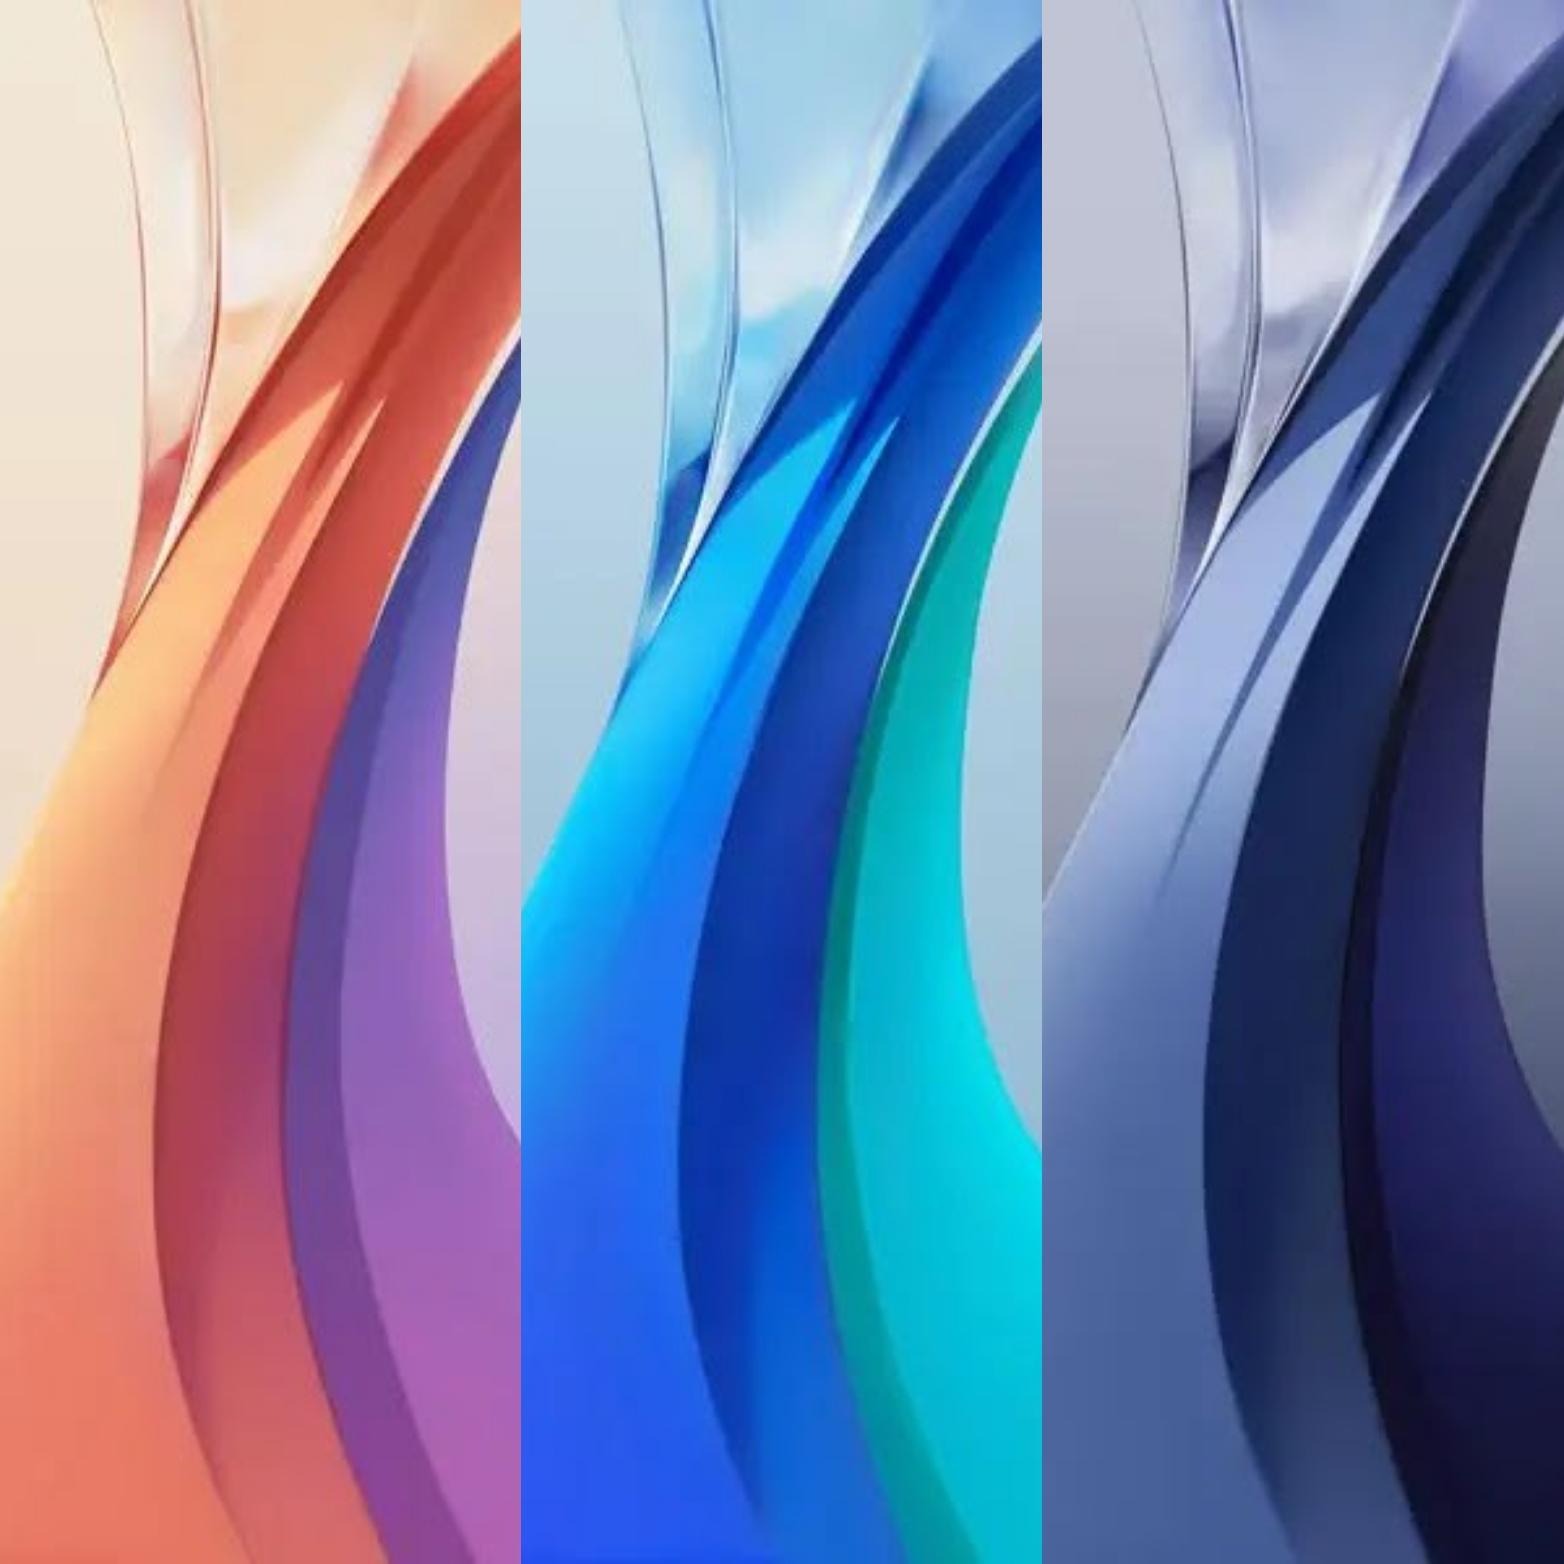 IQOO Z3 Wallpapers